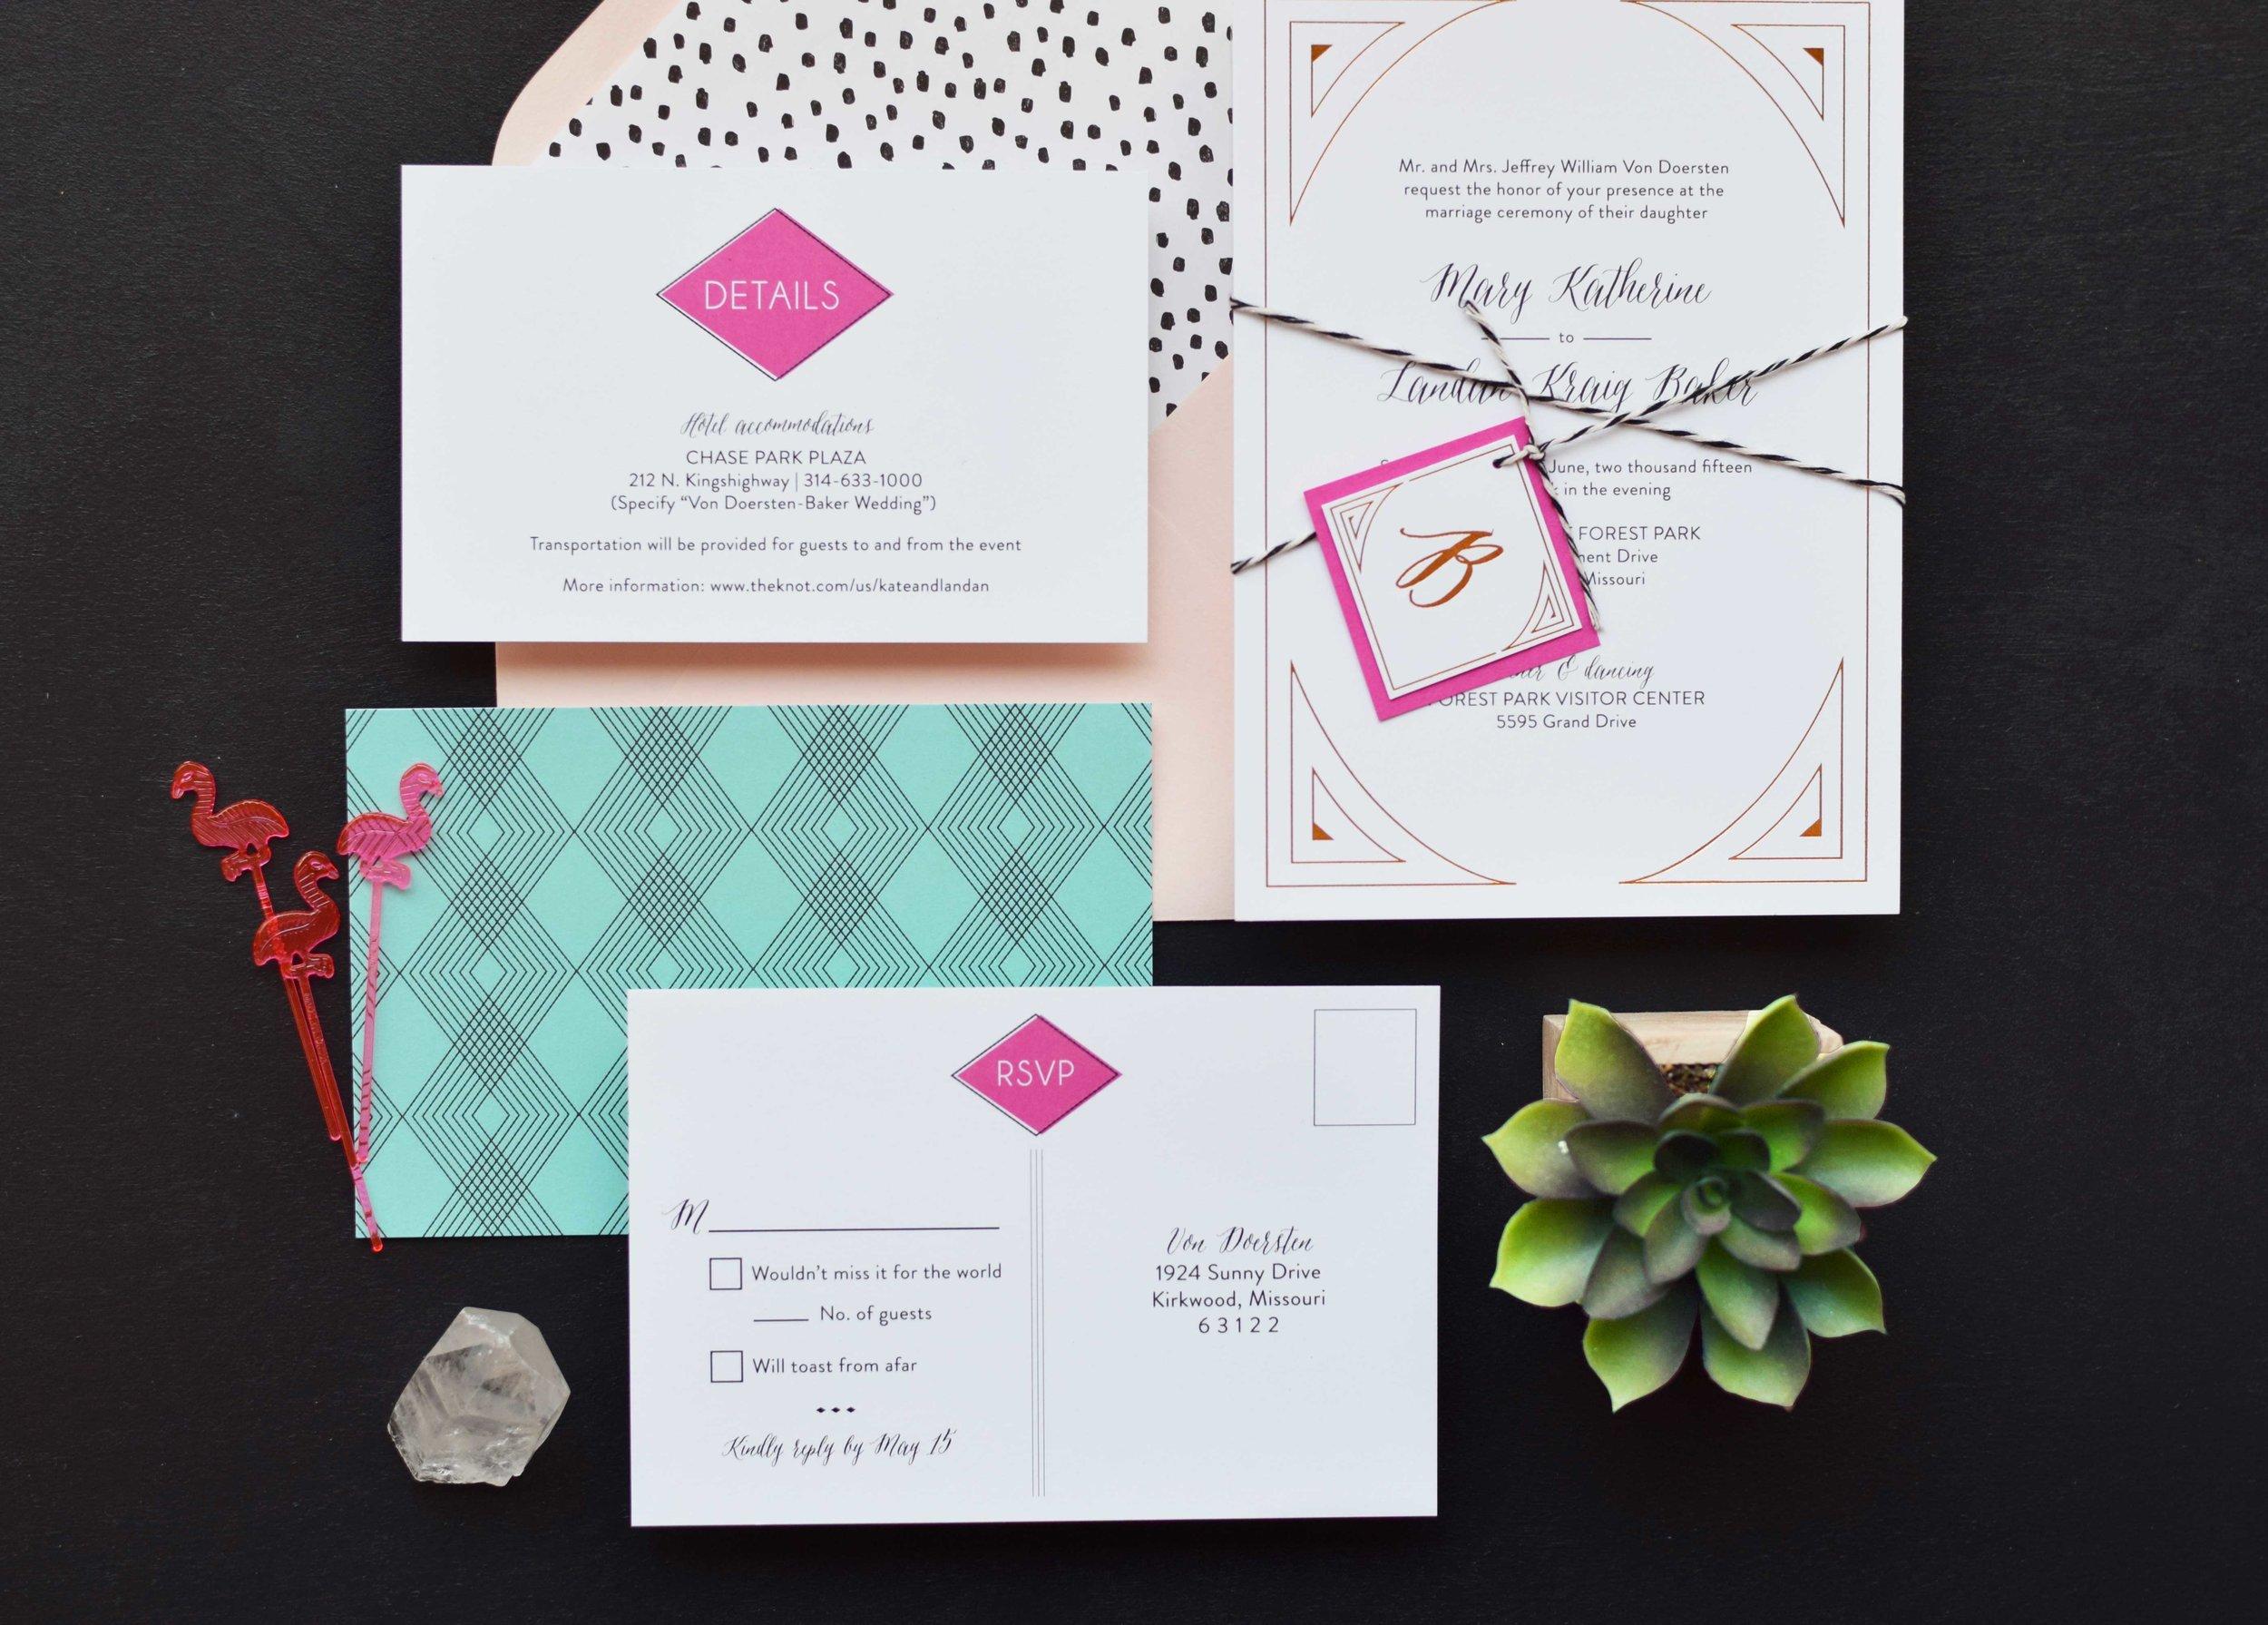 blush_pink_turquoise_art_deco_wedding_invitation.jpg